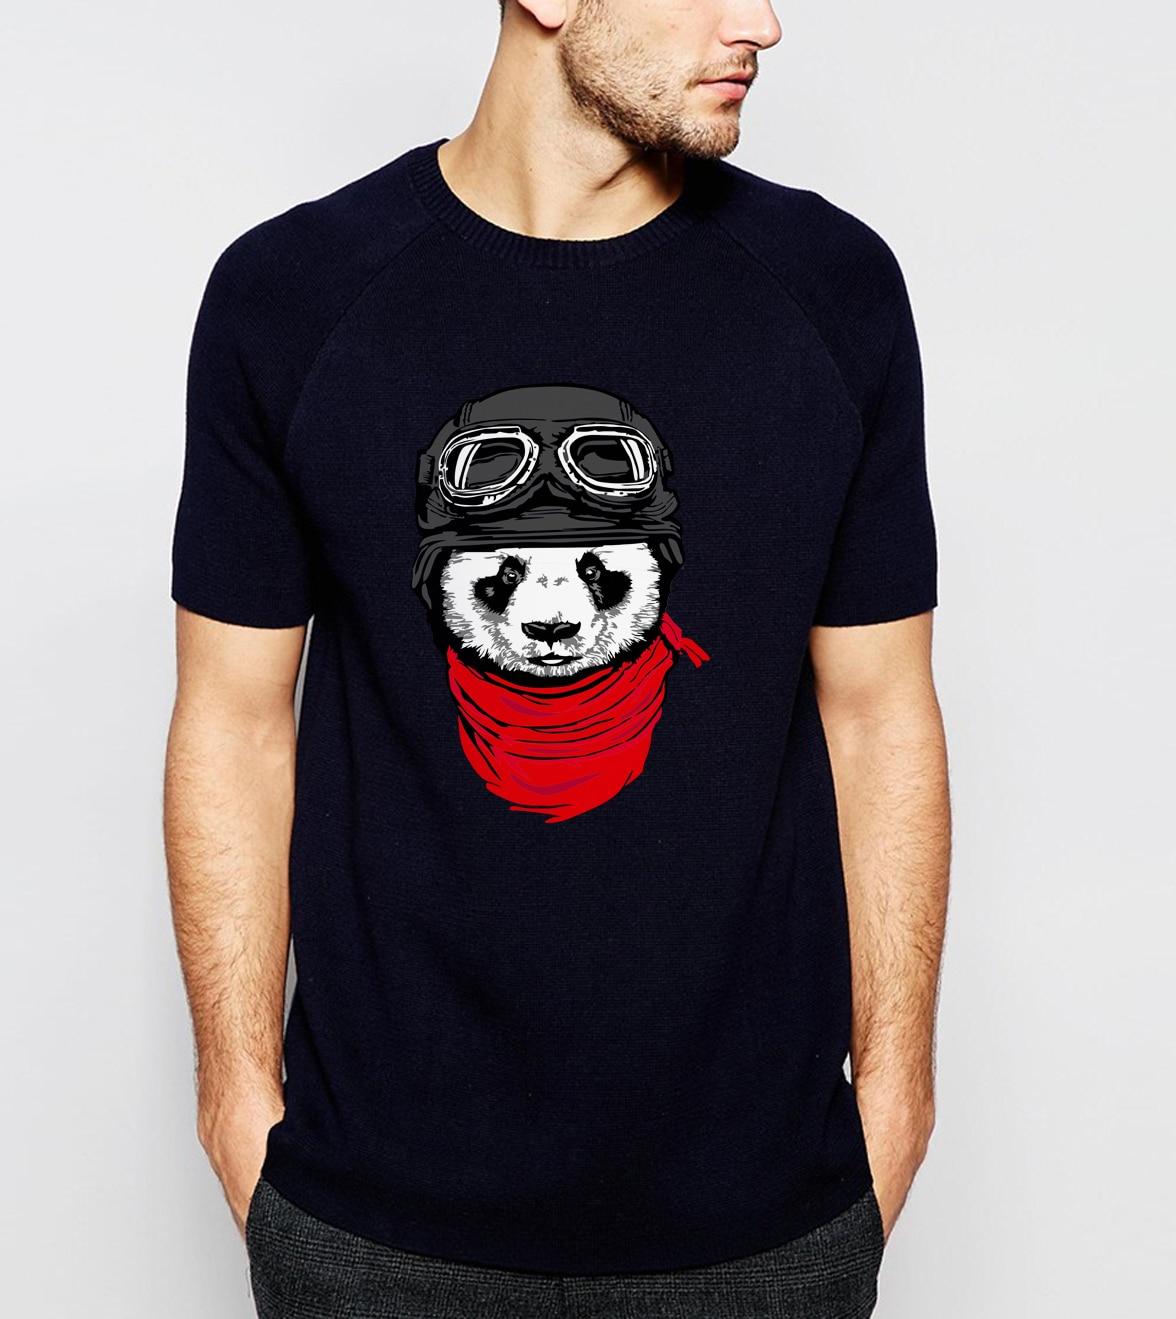 New Arrival Cute Panda Printed Men T-shirt 2019 Summer Fashion 100% Cotton High Quality Harajuku Streetwear Hip Hop Tee Shirt